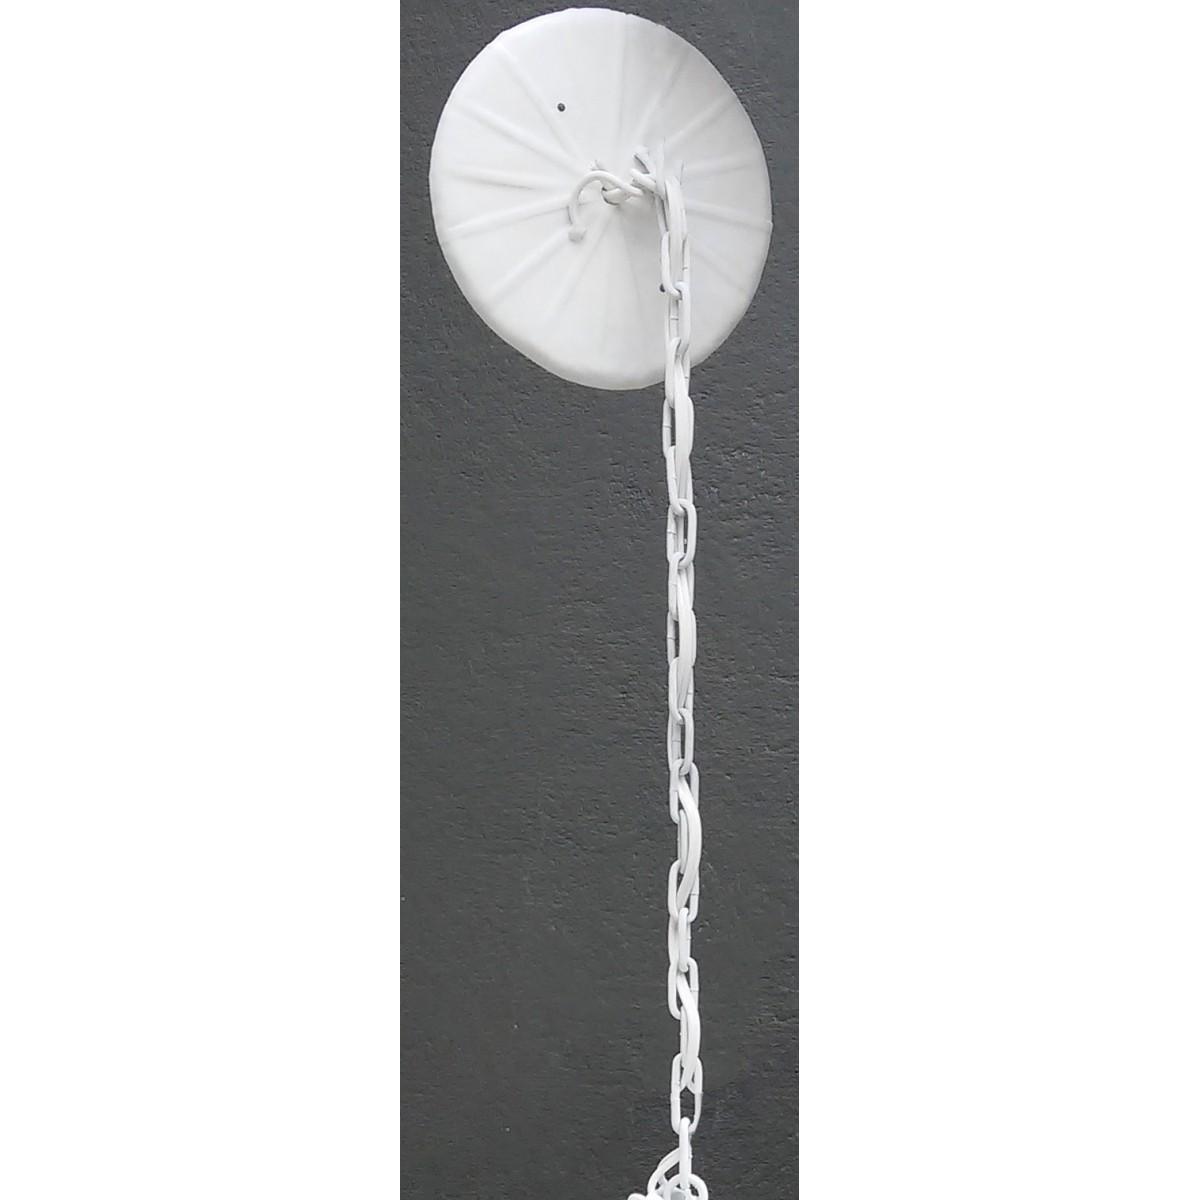 Pendente Com Cristal Lustre Provençal Candelabro de Ferro Rustico